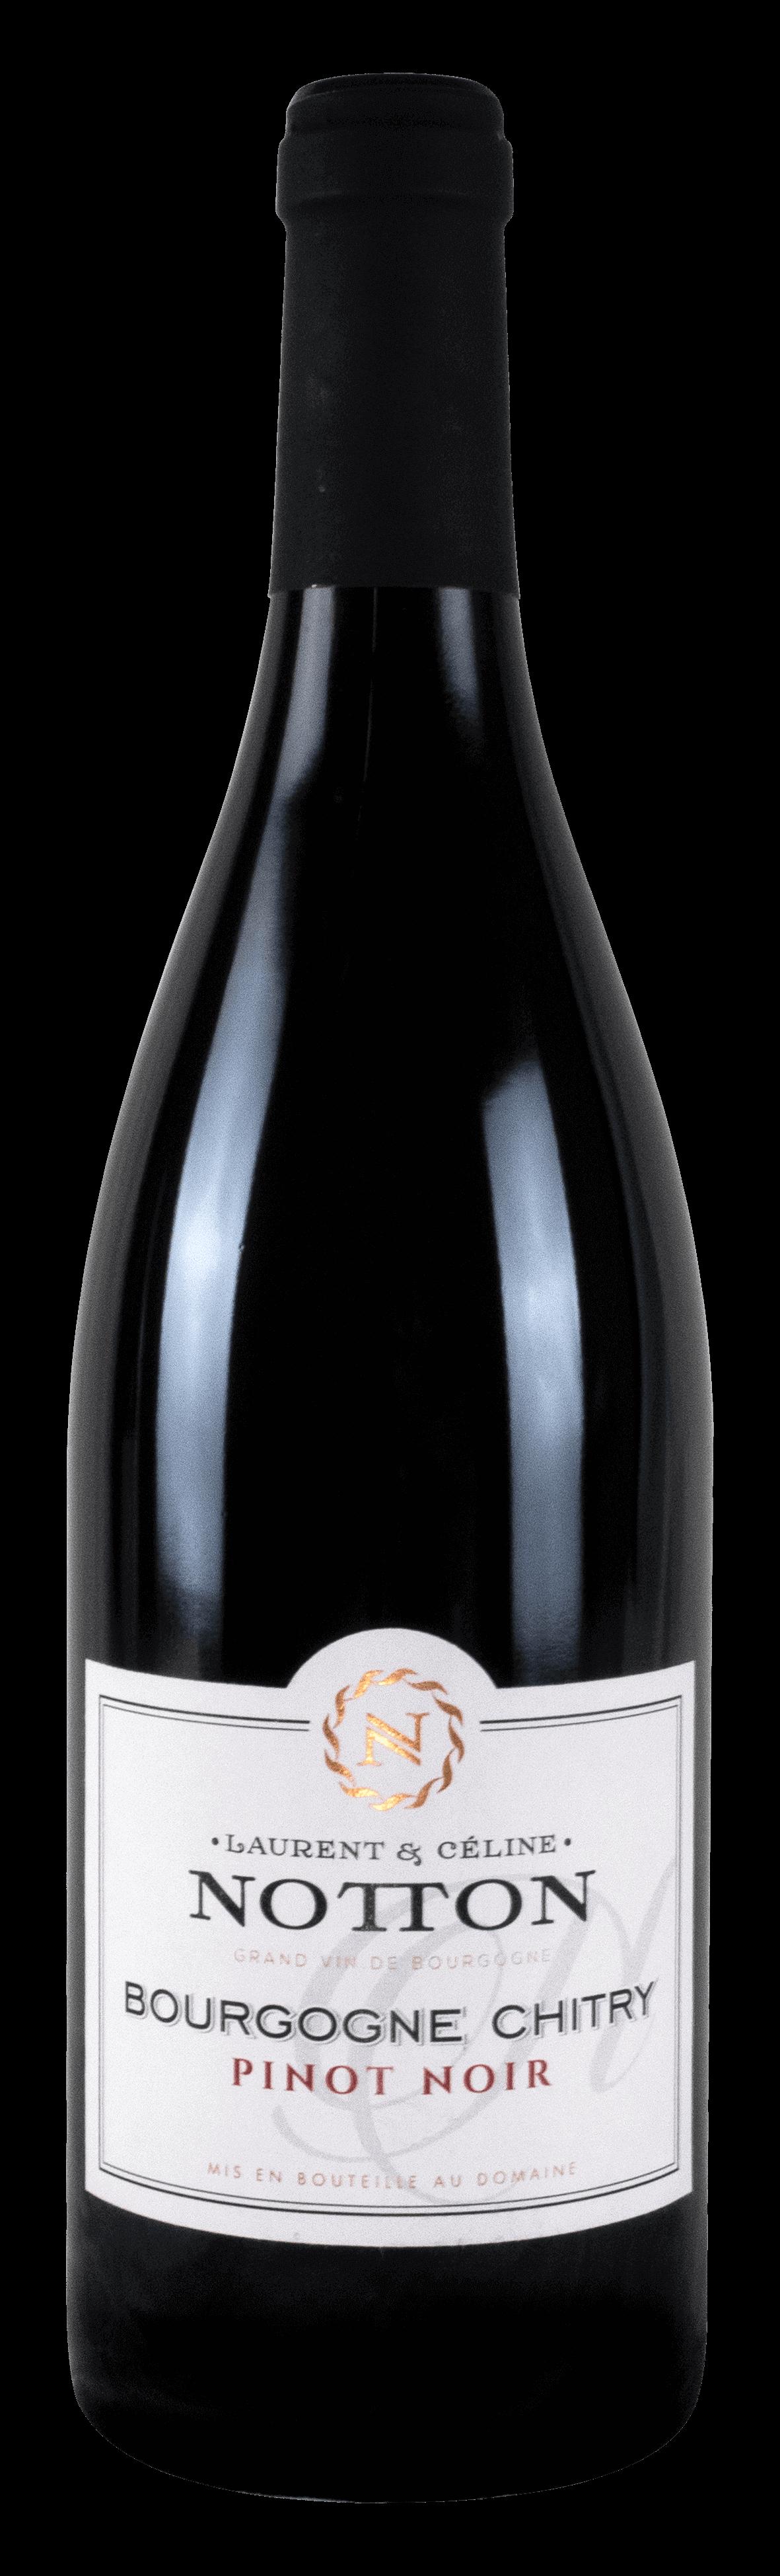 bouteille Domaine NOTTON Bourgogne Chitry Pinot Noir